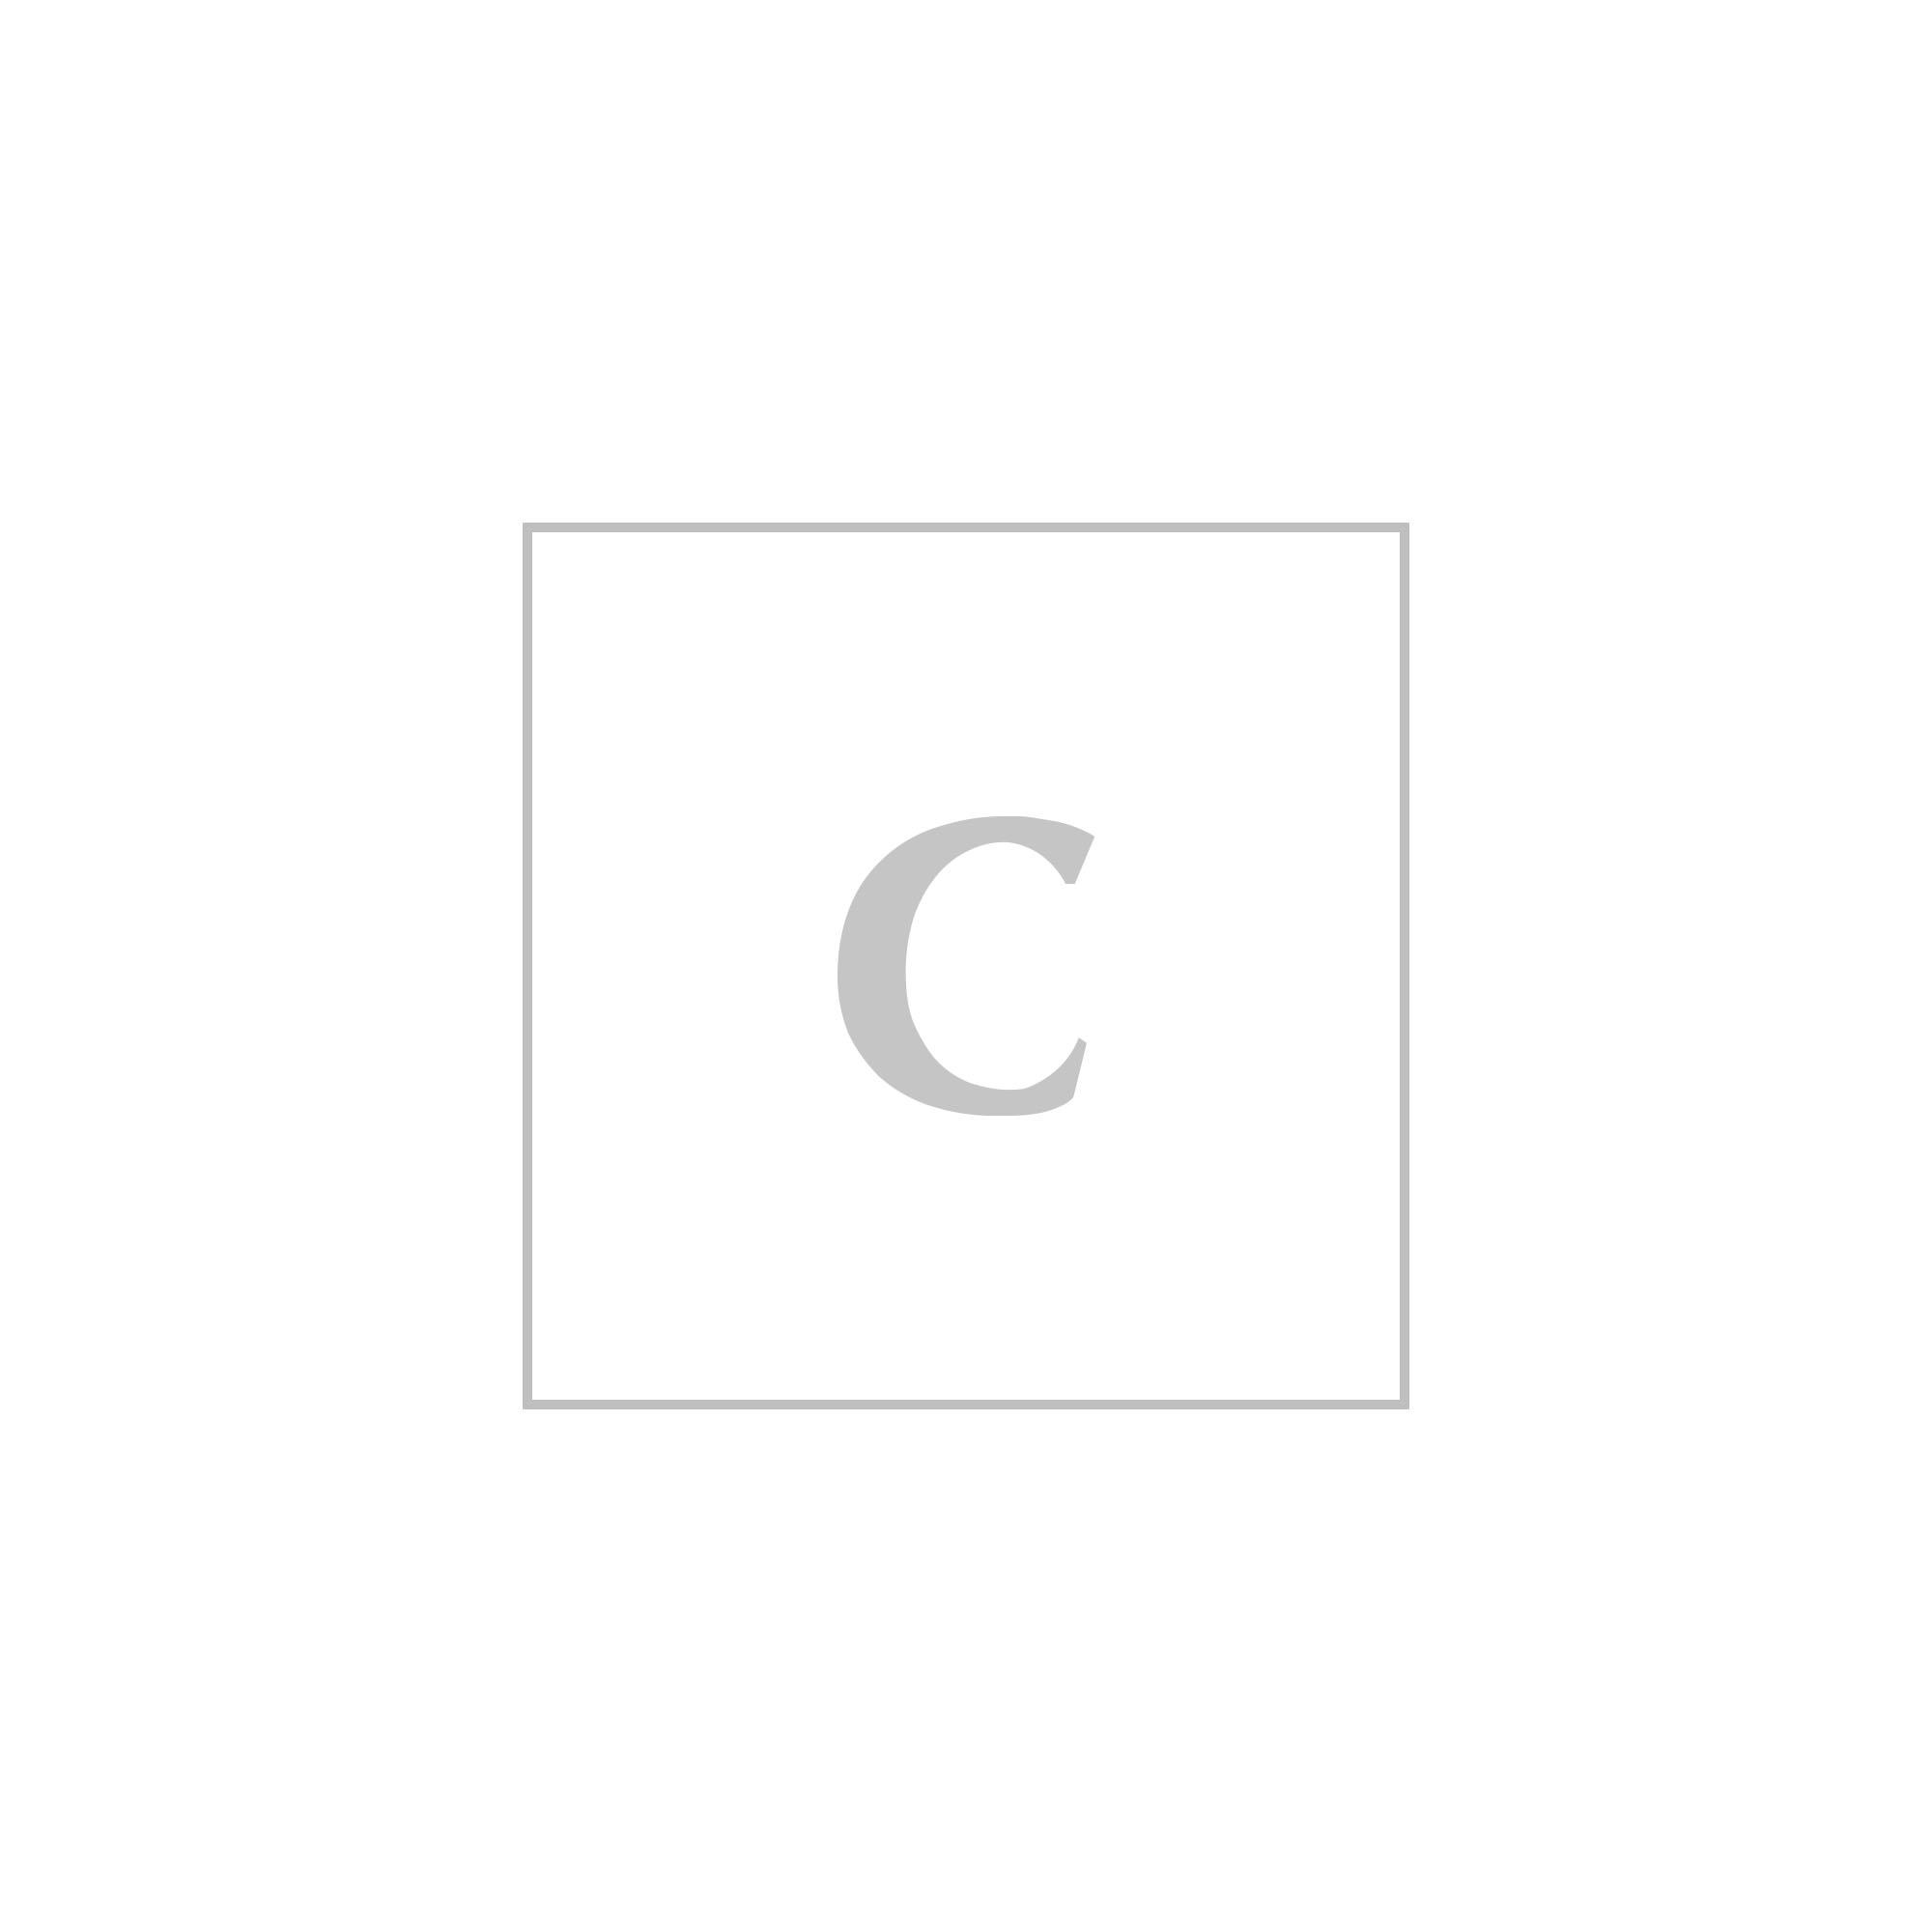 Dolce & gabbana borsa monica in pelle